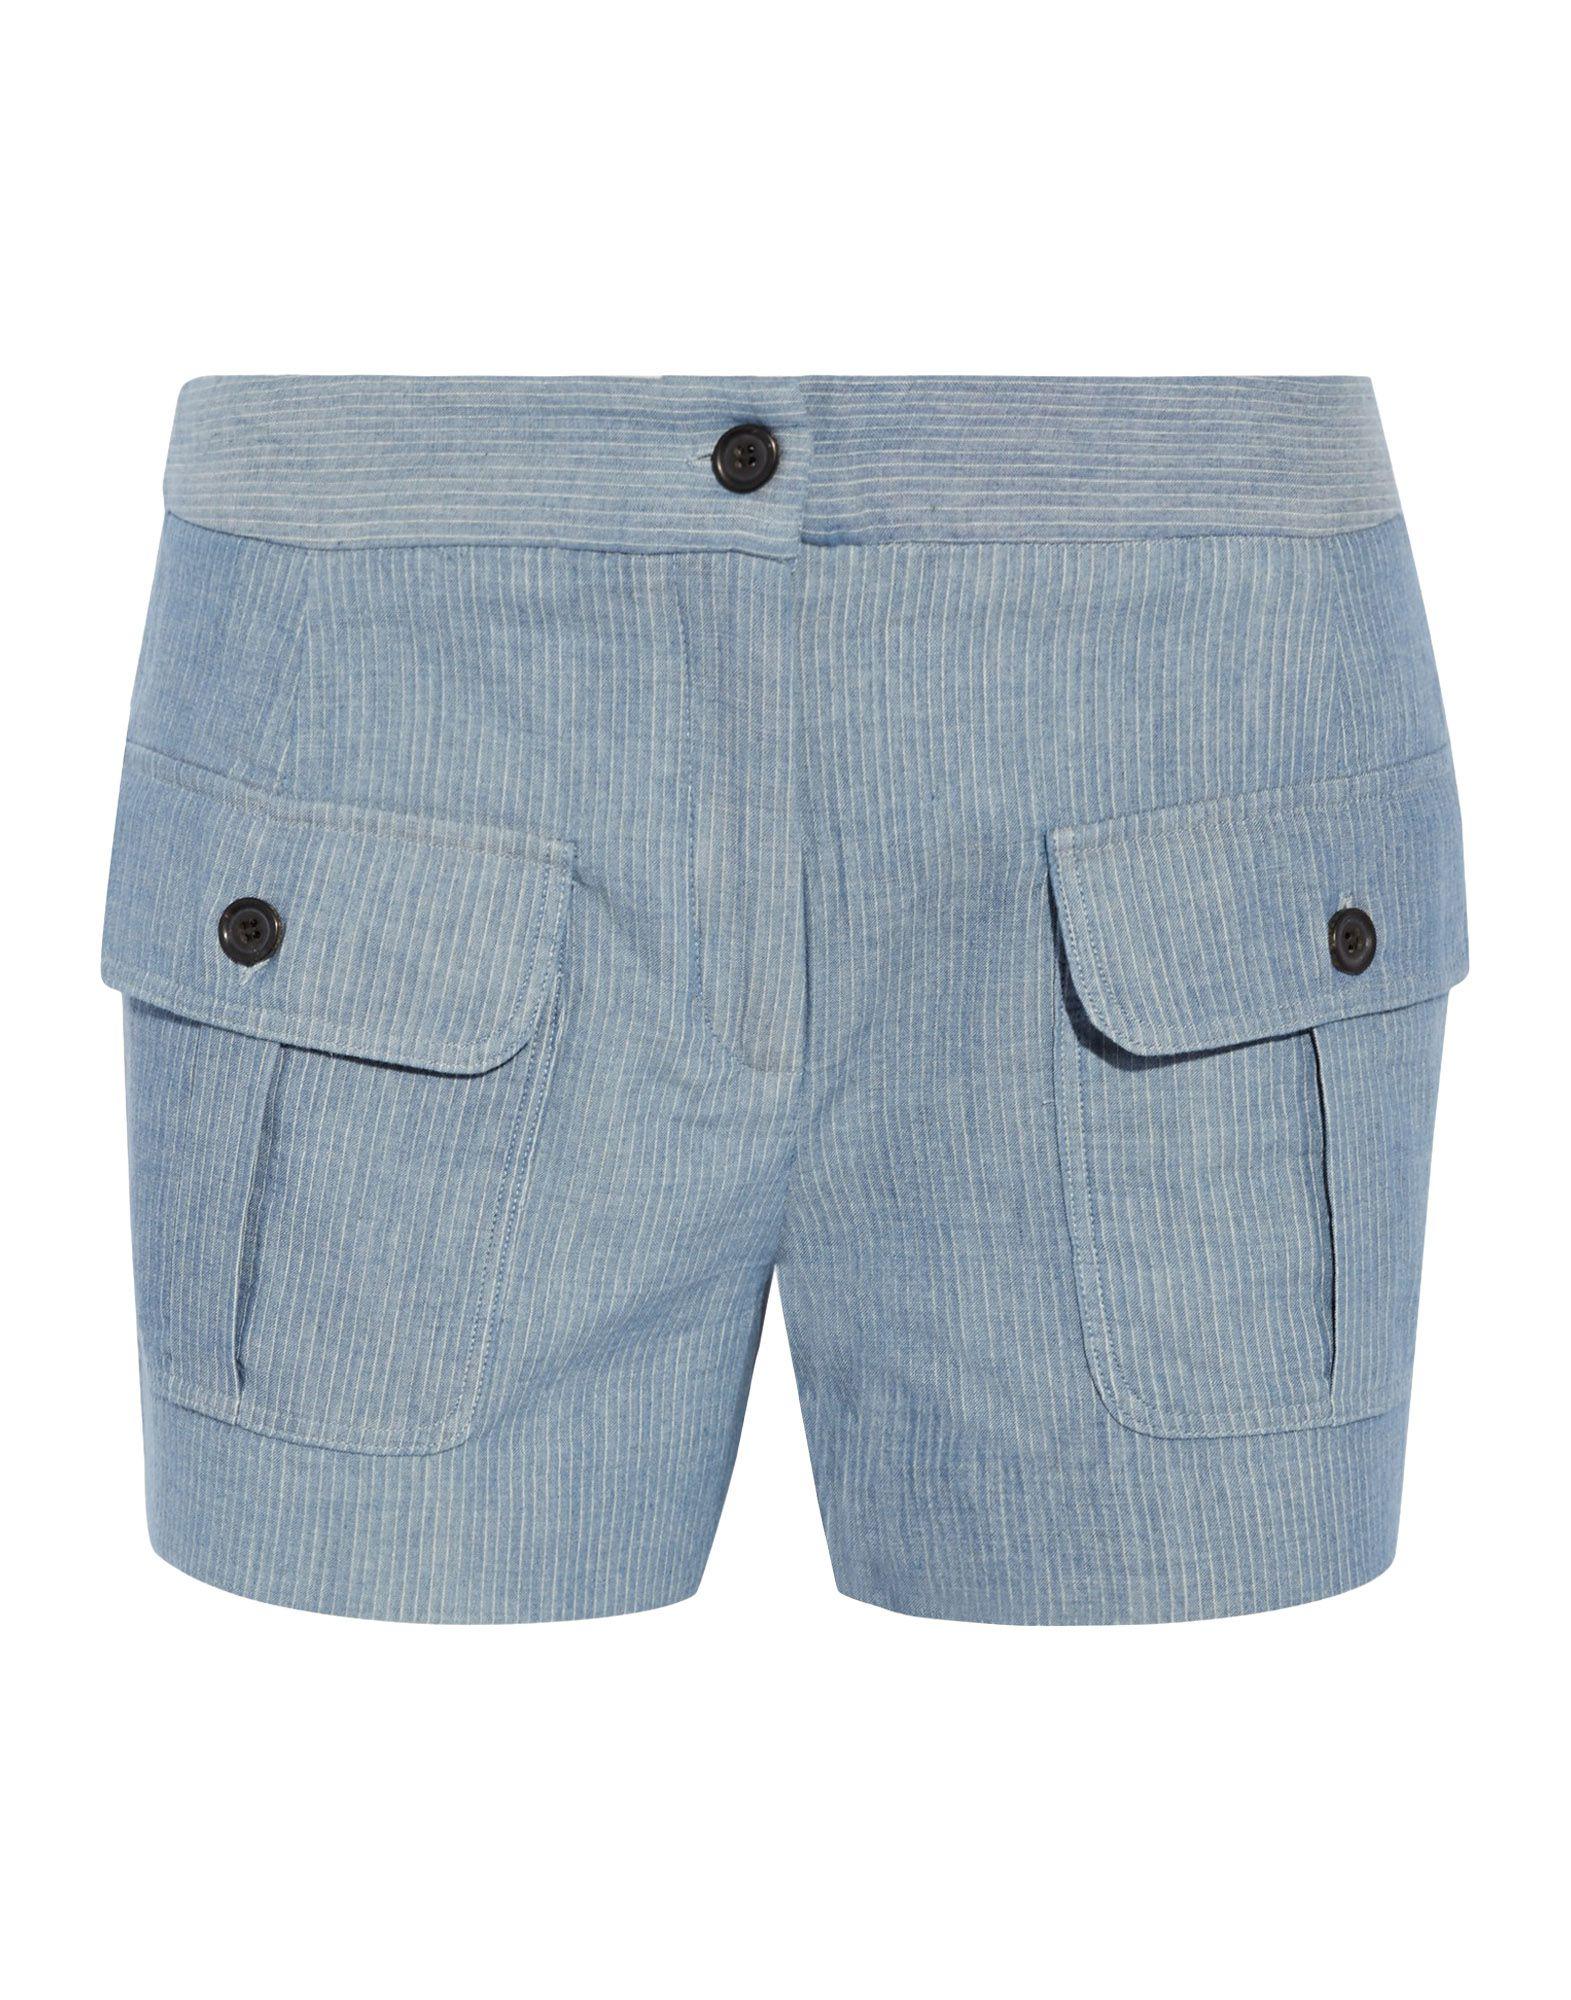 Фото - PAUL & JOE Повседневные шорты jean paul gaultier le male